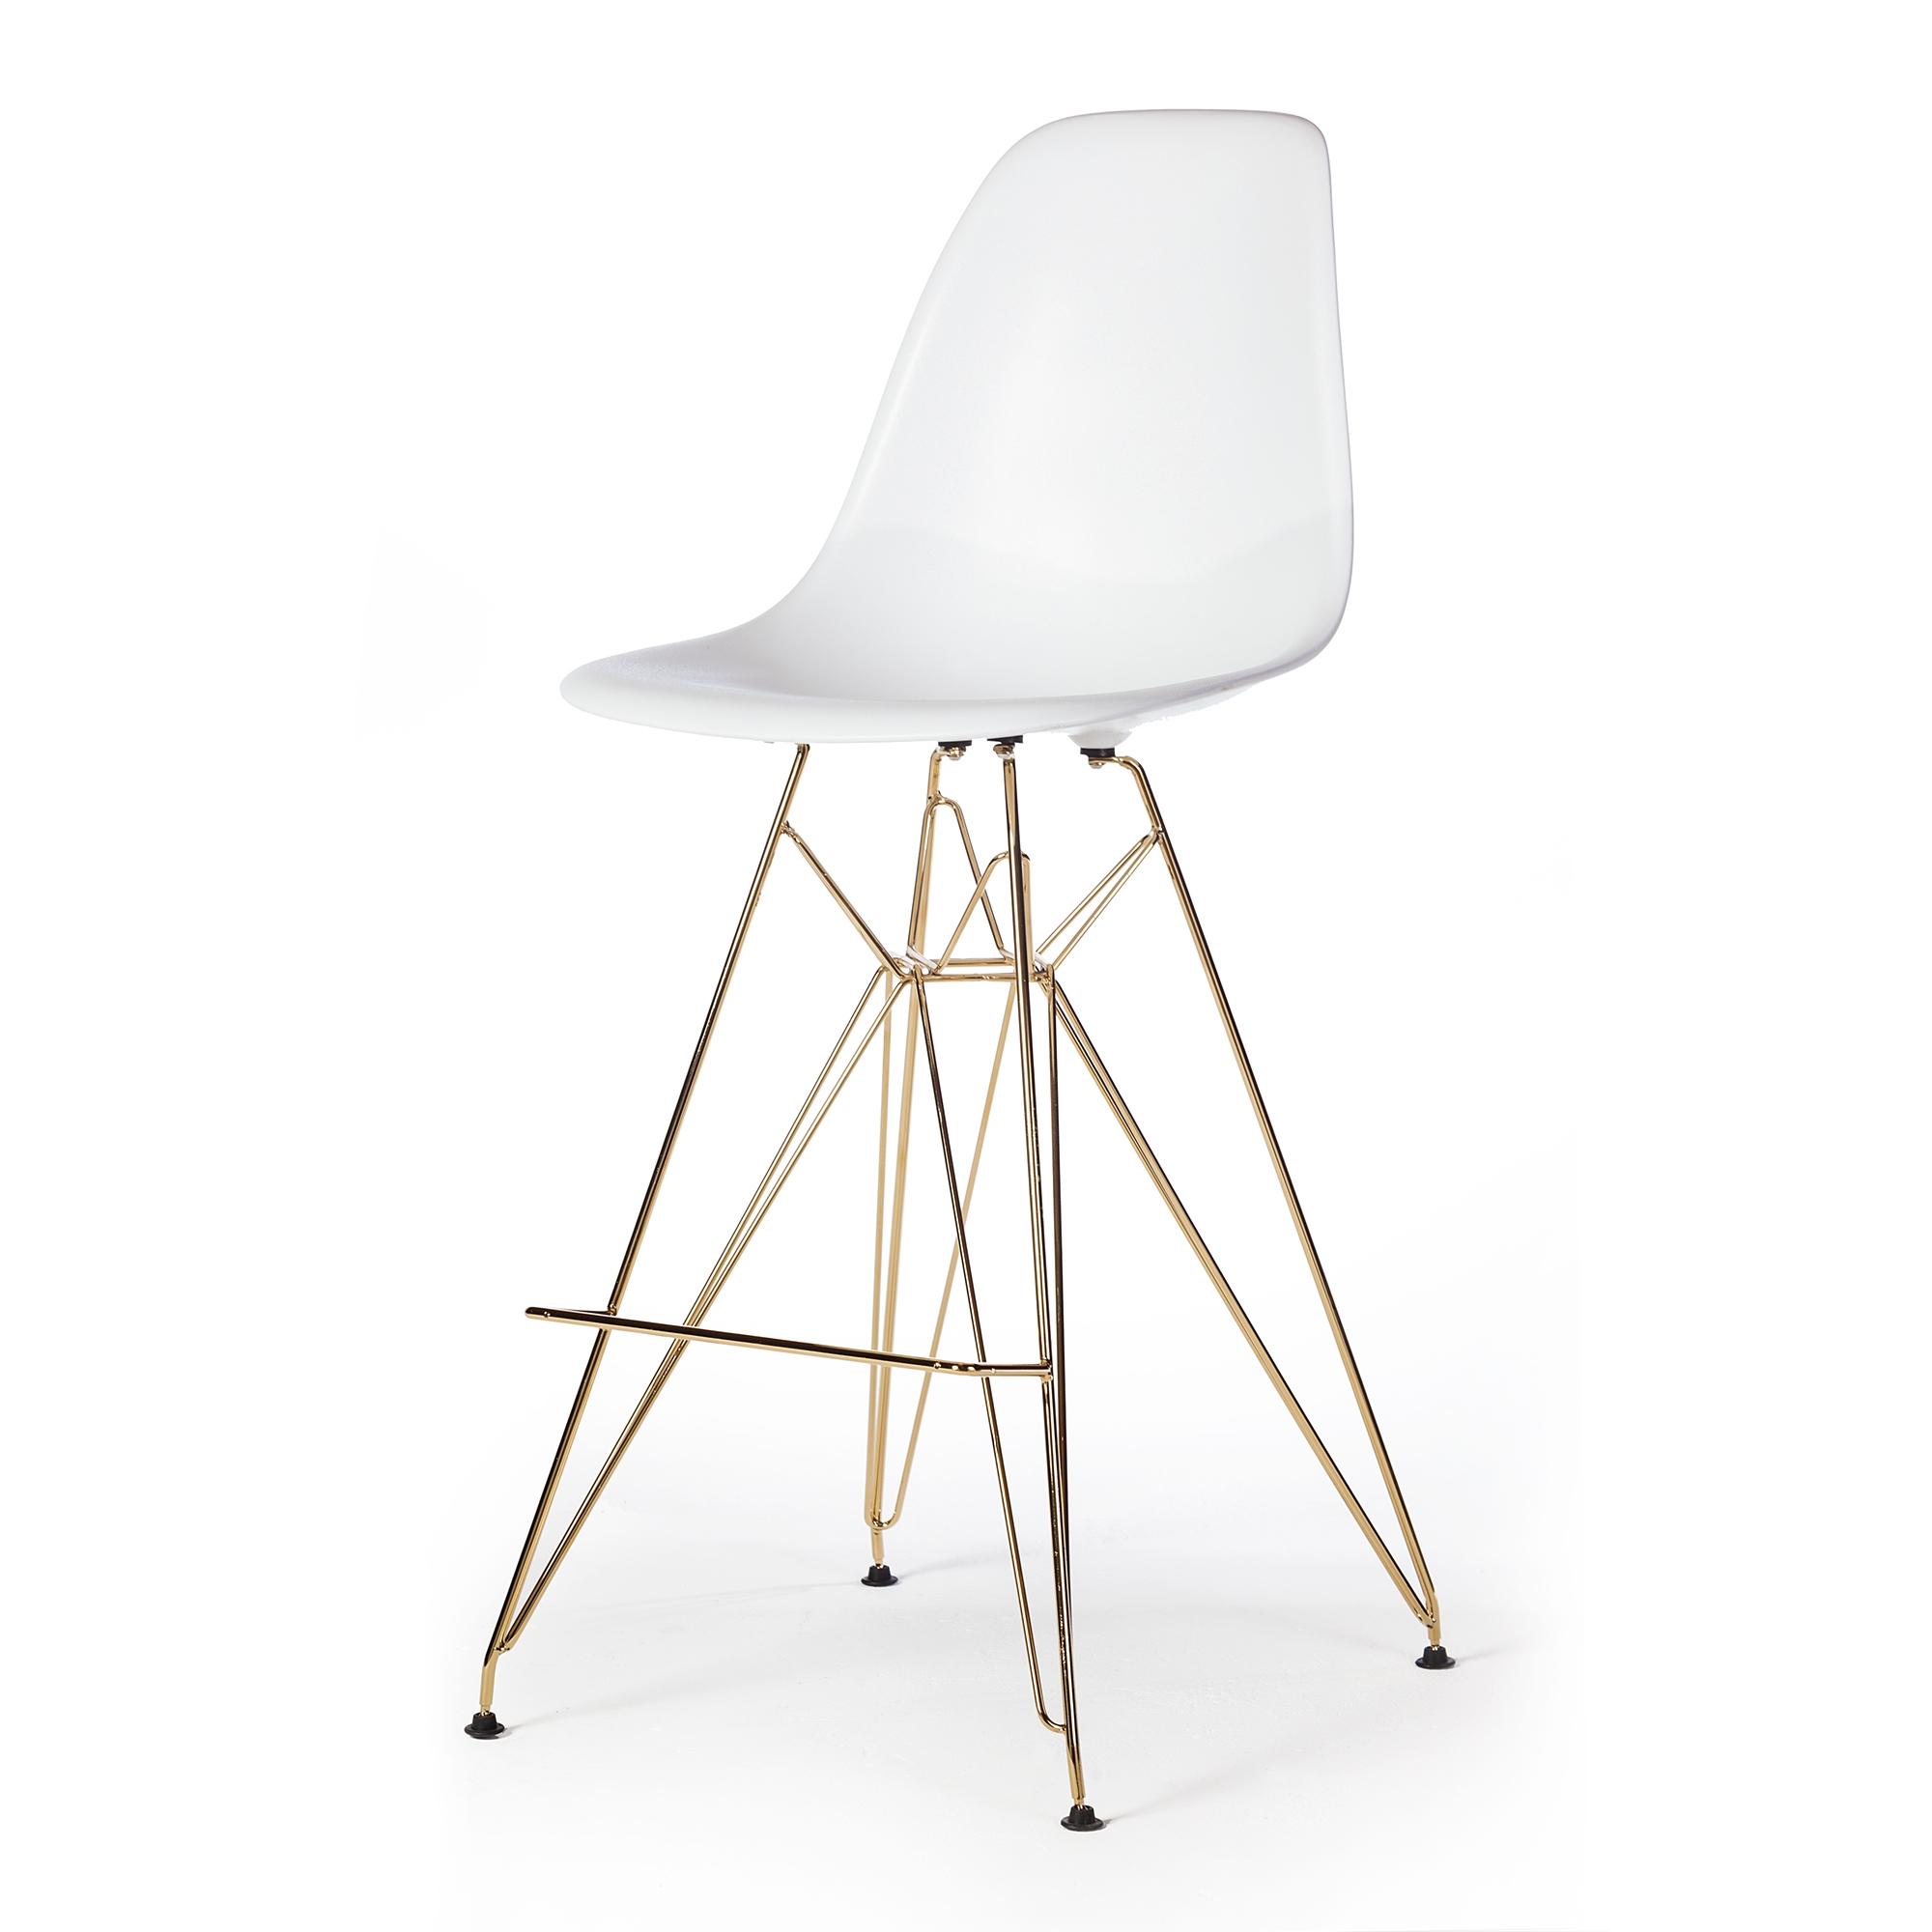 Magnificent Molded Acrylic Counter Stool In White And Gold Finish Legs The Khazana Home Austin Furniture Store Inzonedesignstudio Interior Chair Design Inzonedesignstudiocom